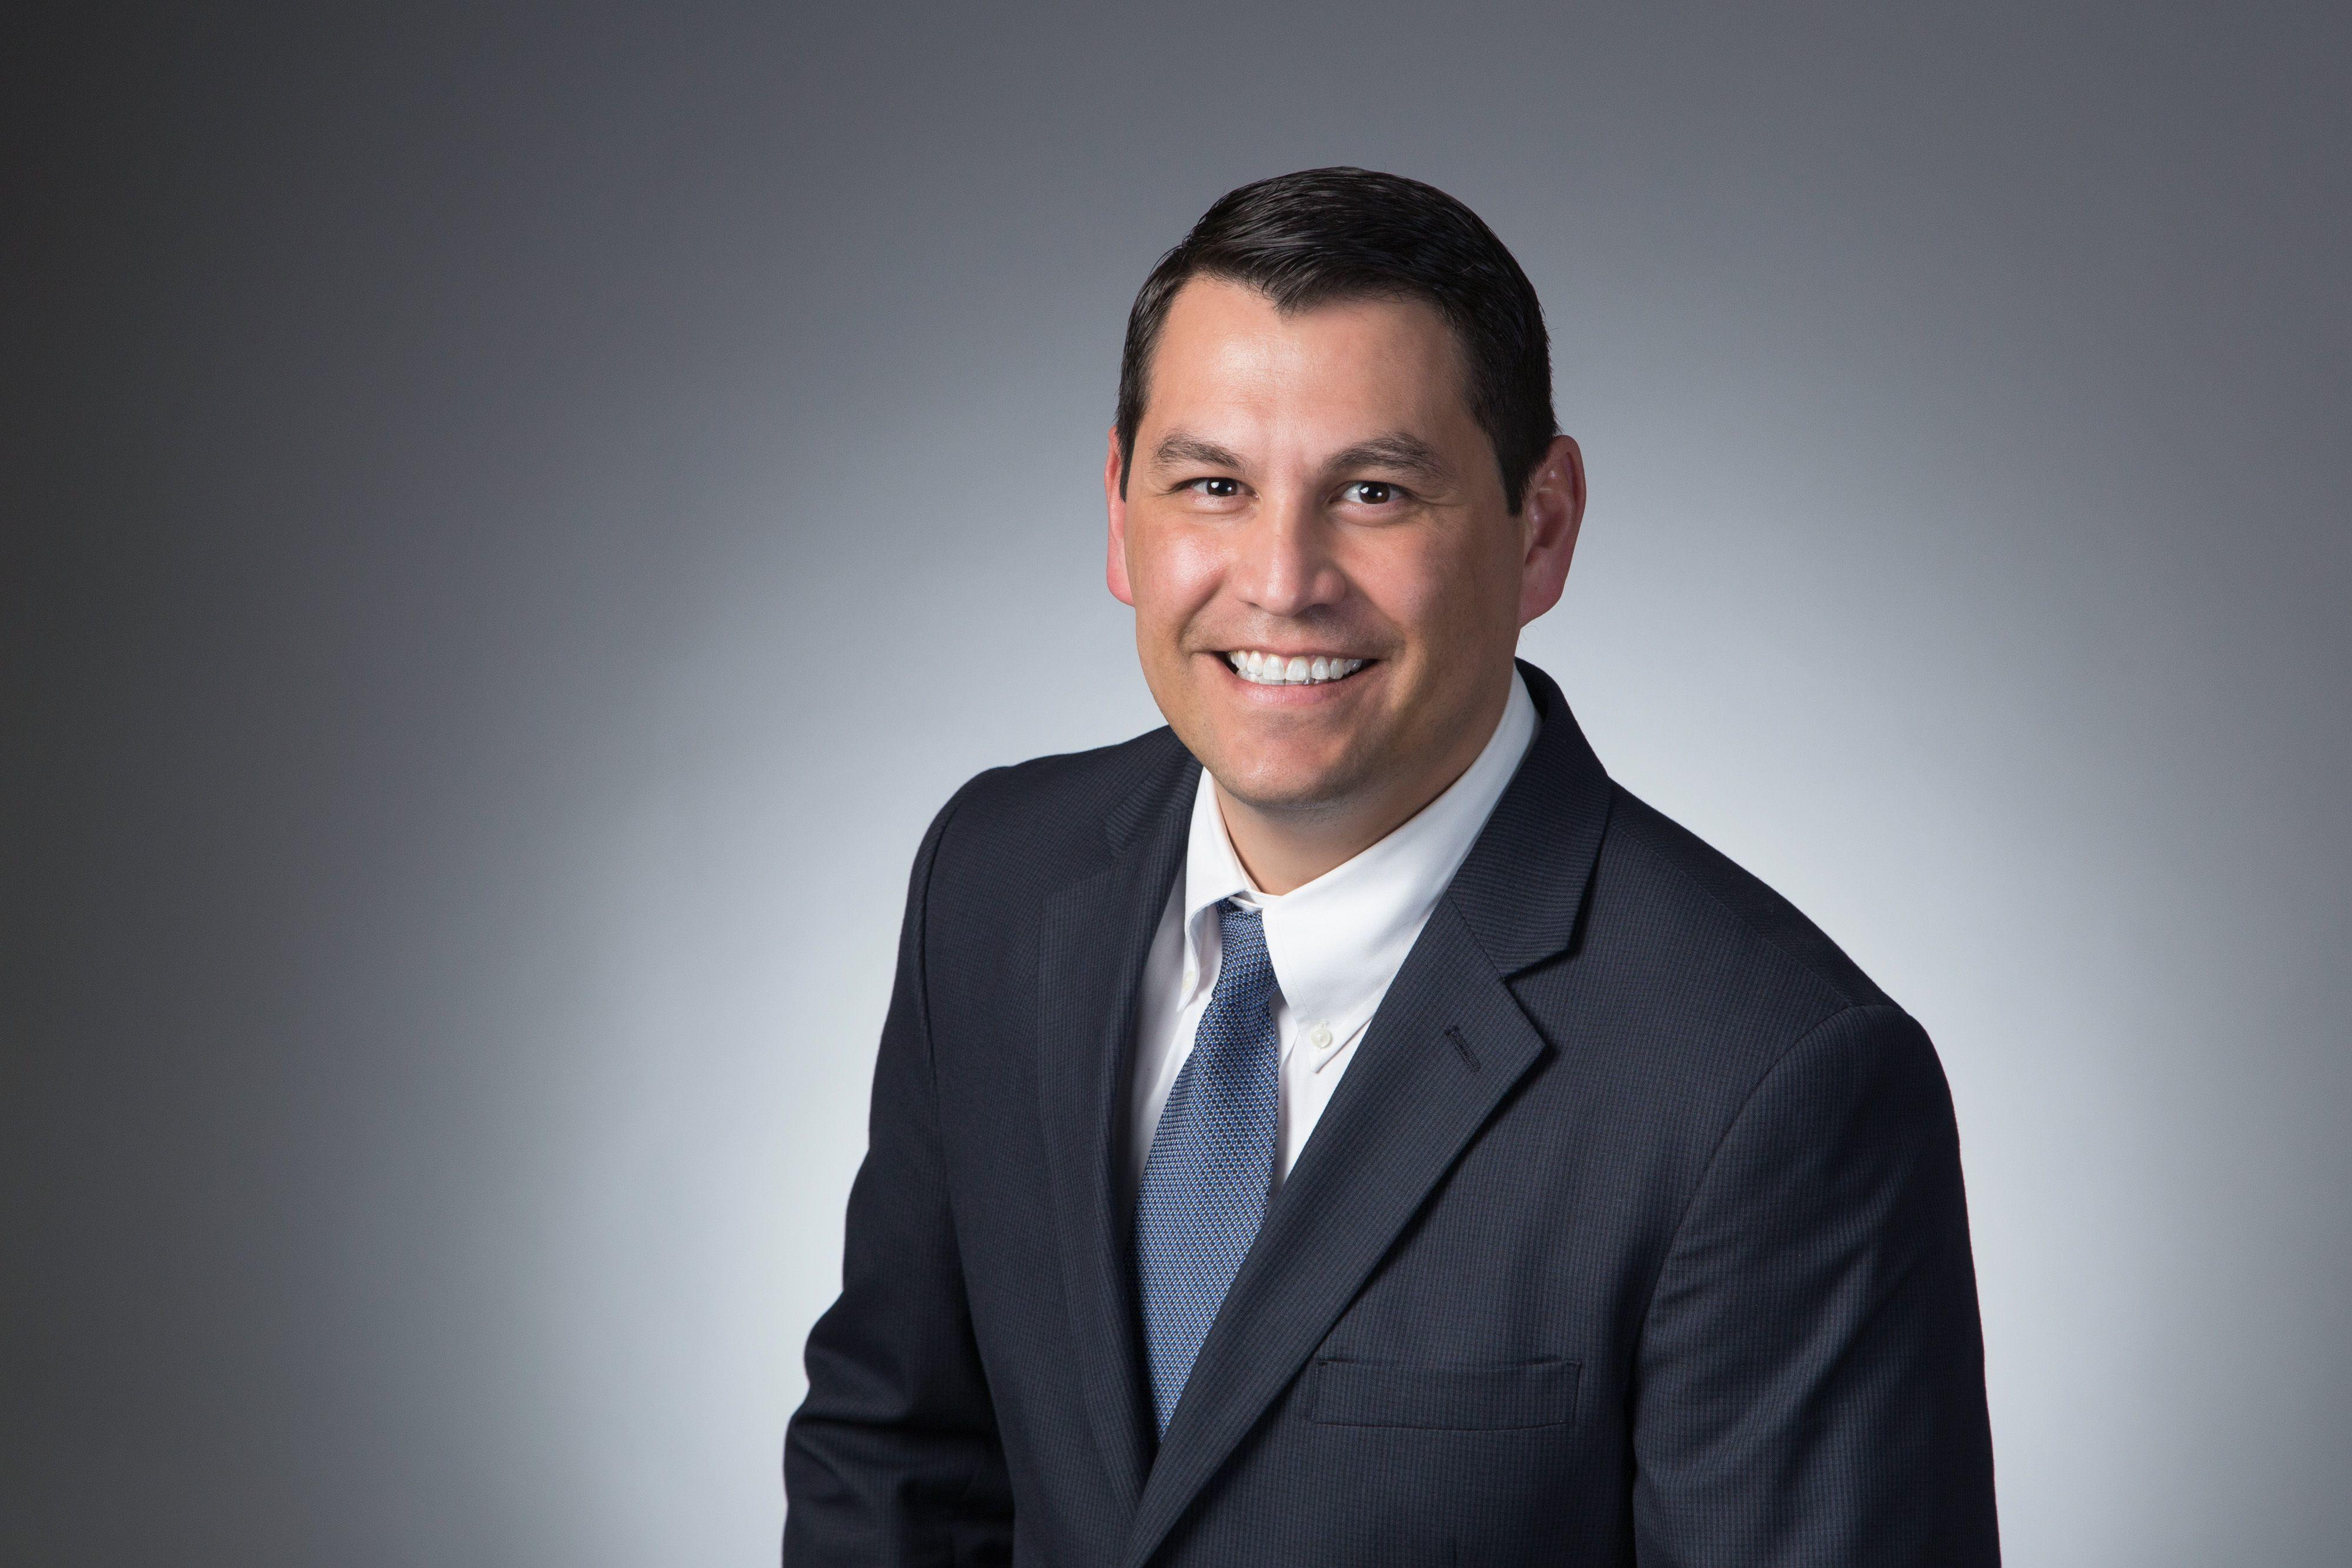 Michael D. - Energy Tech Hub (Denver, CO)